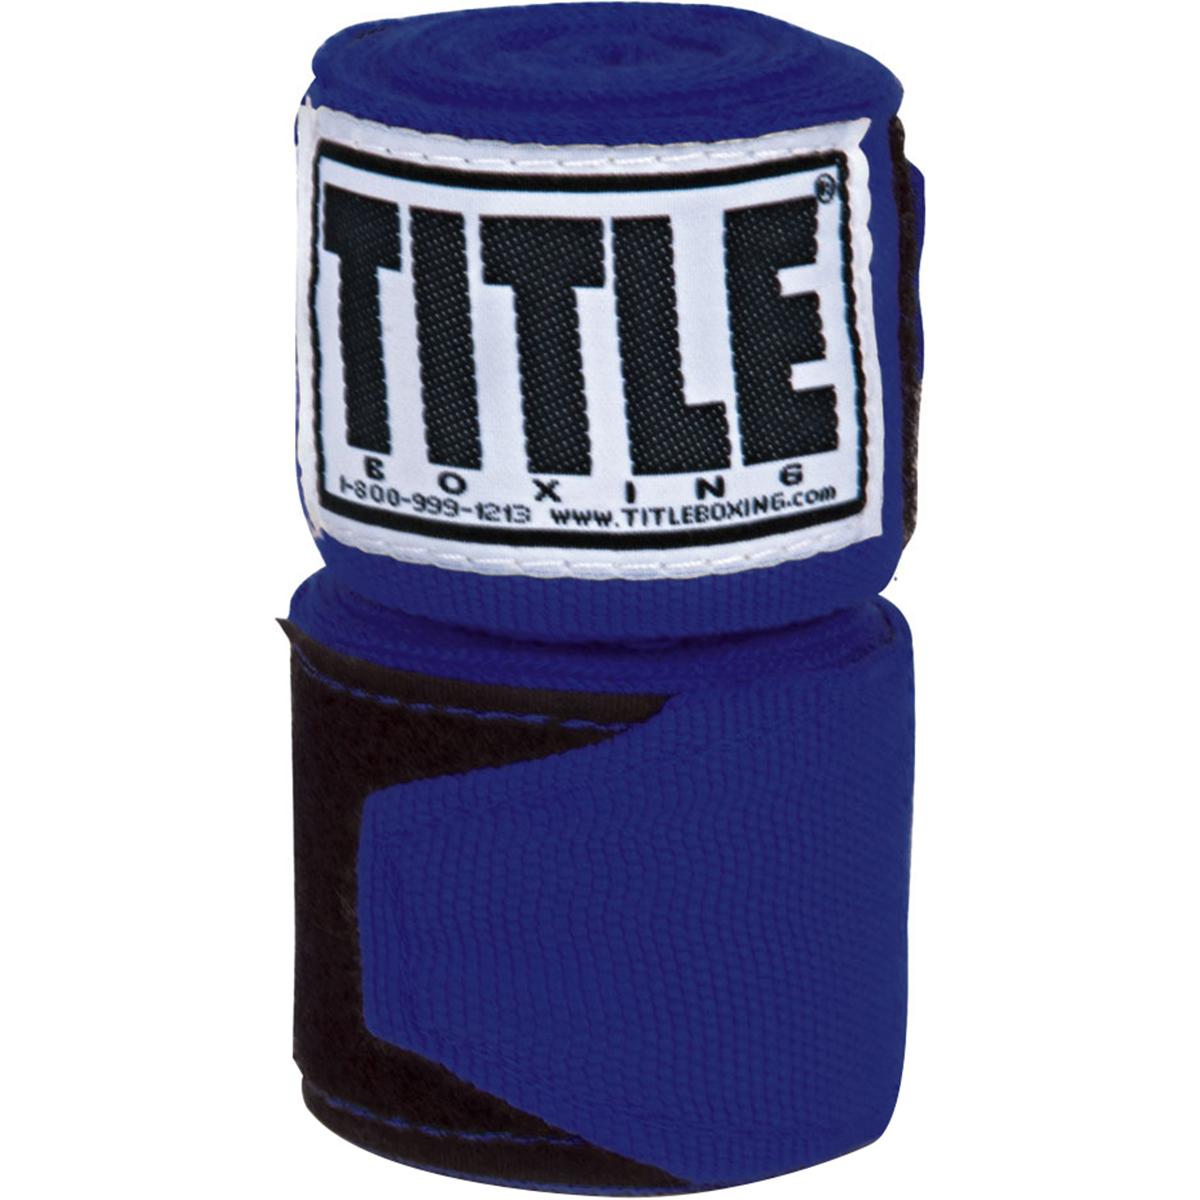 "Title Boxing 120"" Semi Elastic Handwraps - Royal"